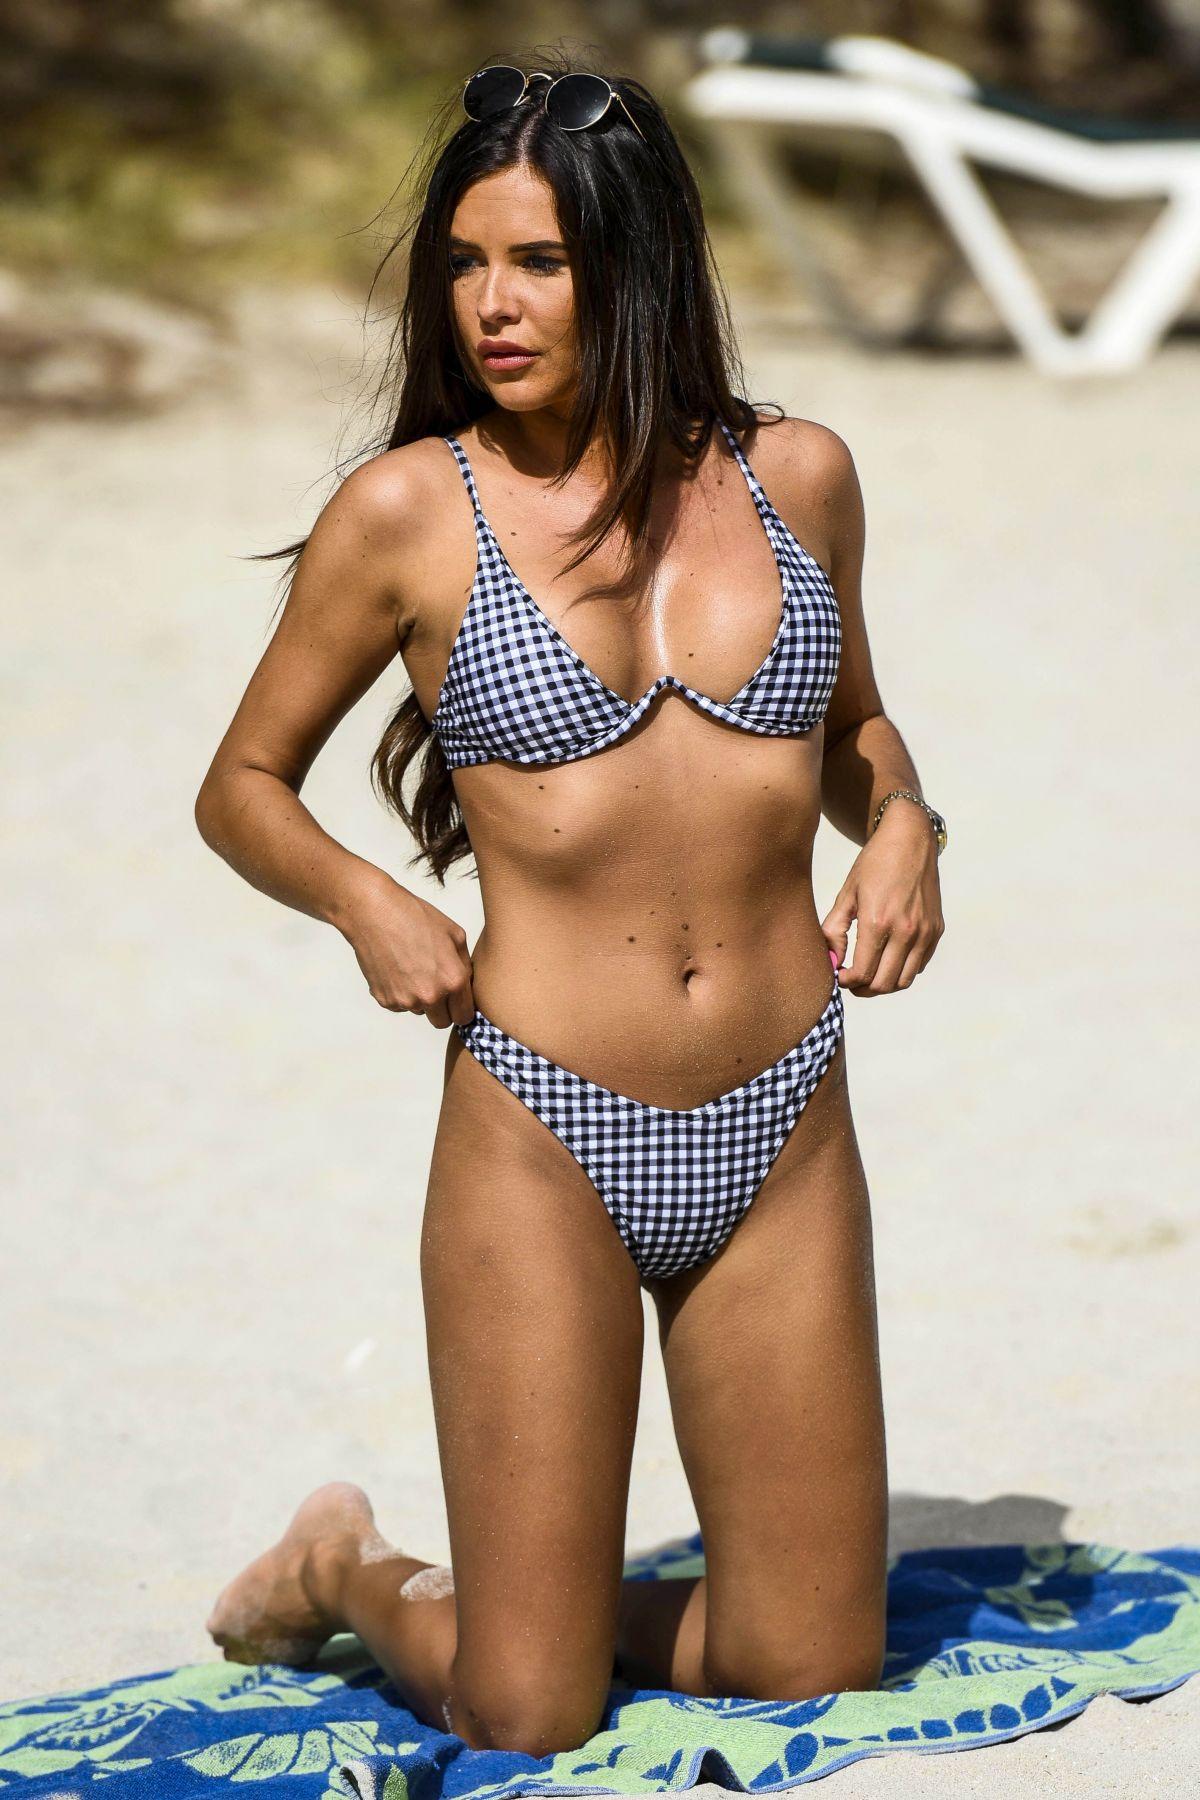 Bikini Clelia Theodorou nude (83 photo), Sexy, Cleavage, Twitter, panties 2017